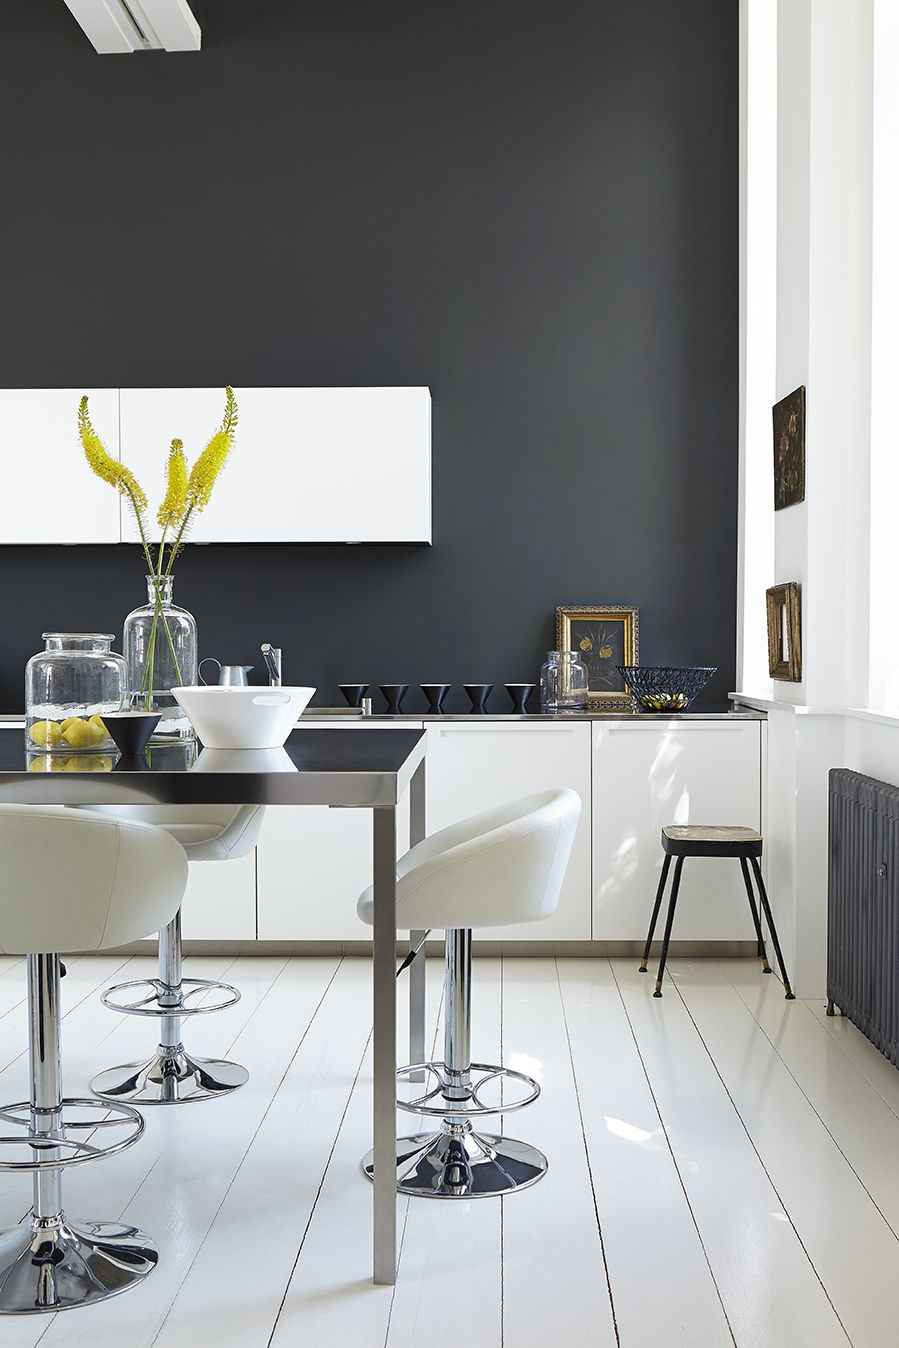 Little greene, Interieur and Ash on Pinterest